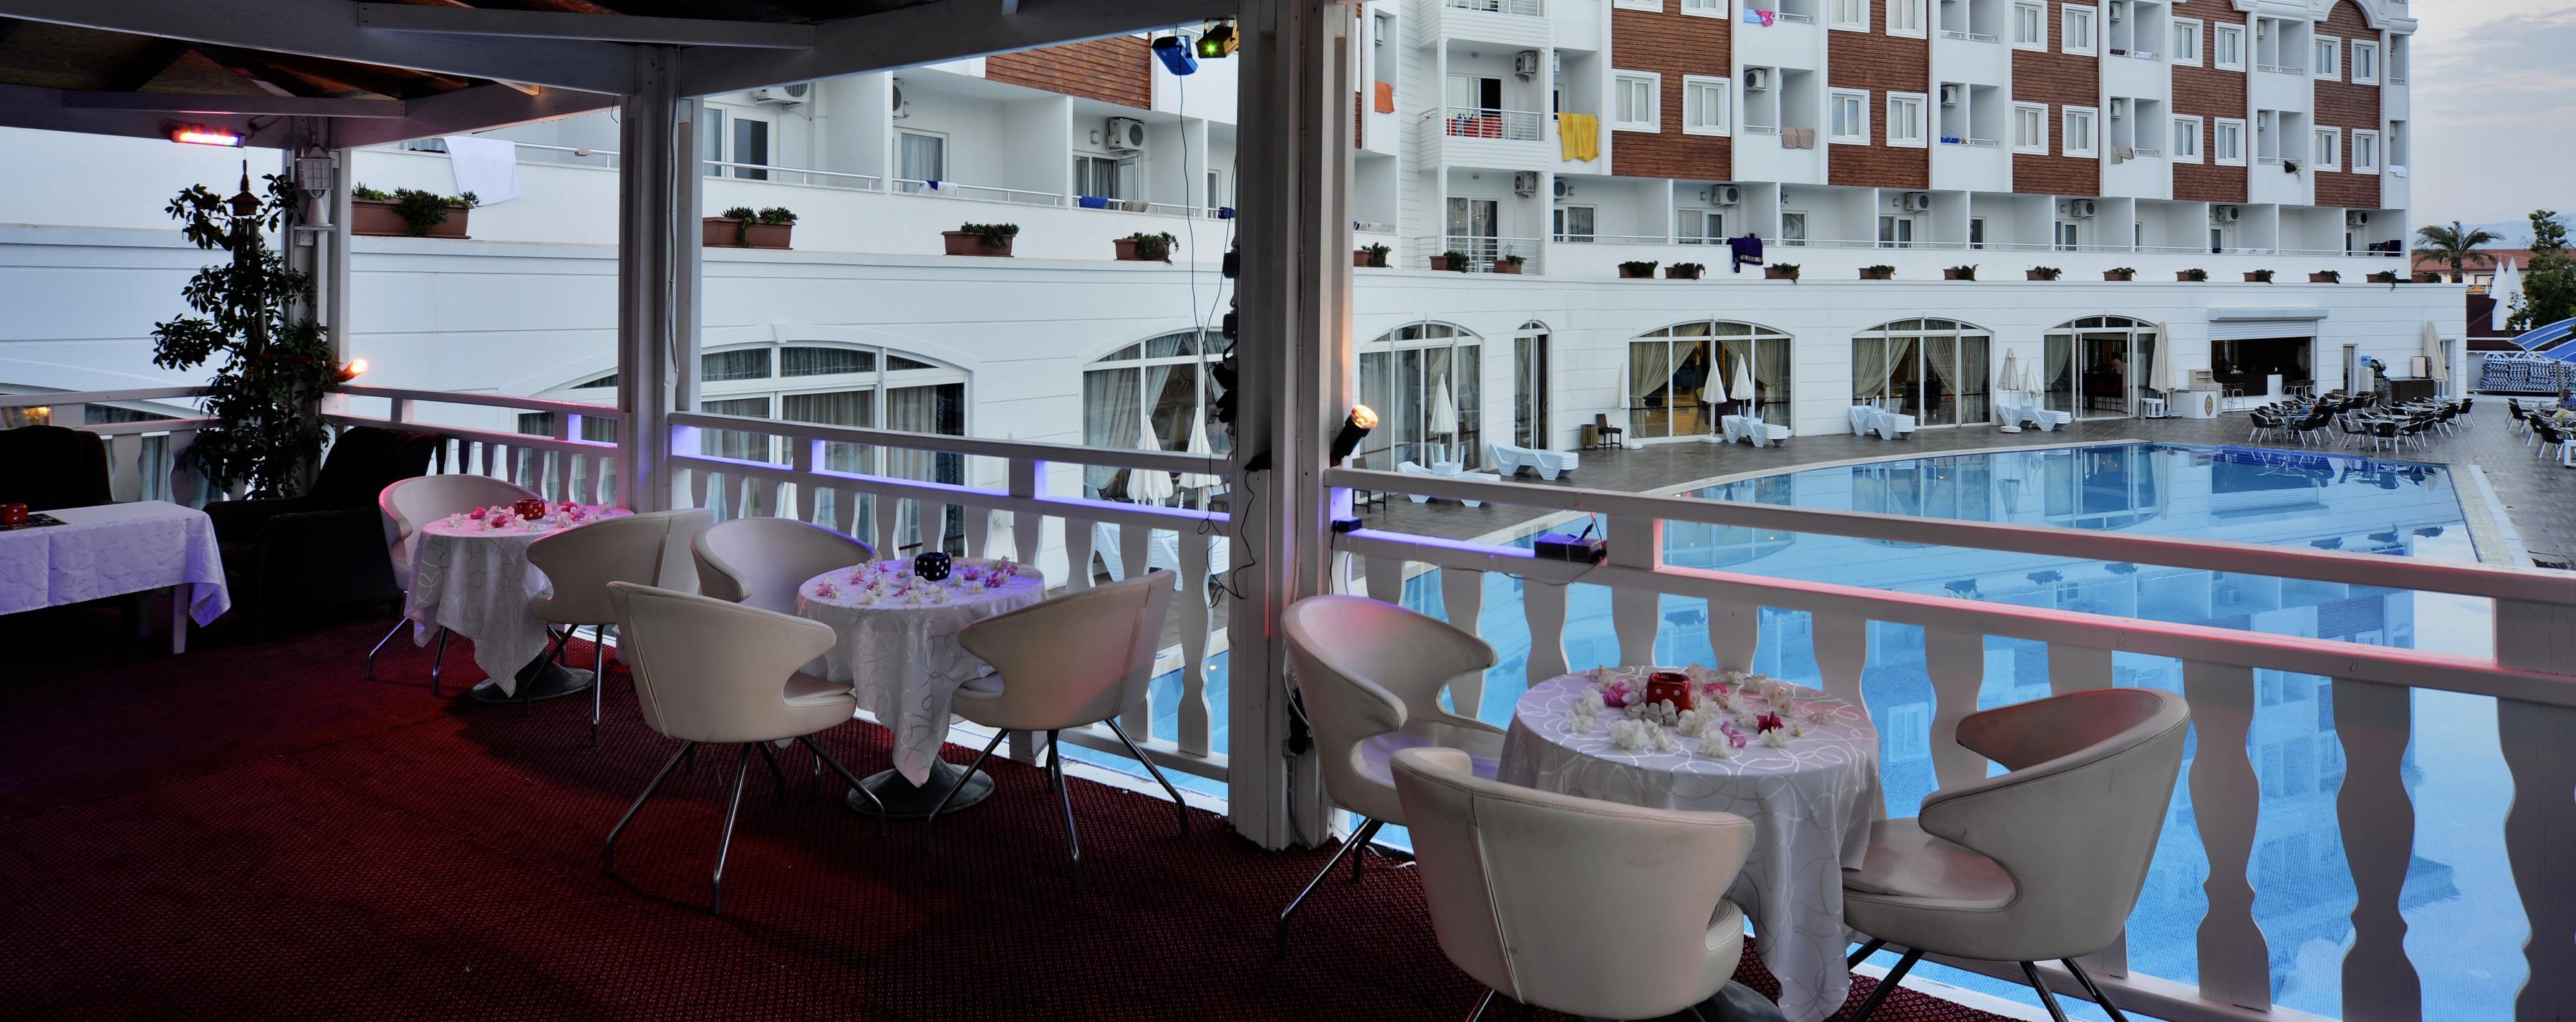 http://www.orextravel.sk/OREX/hotelphotos/side-royal-paradise-general-0028.jpg